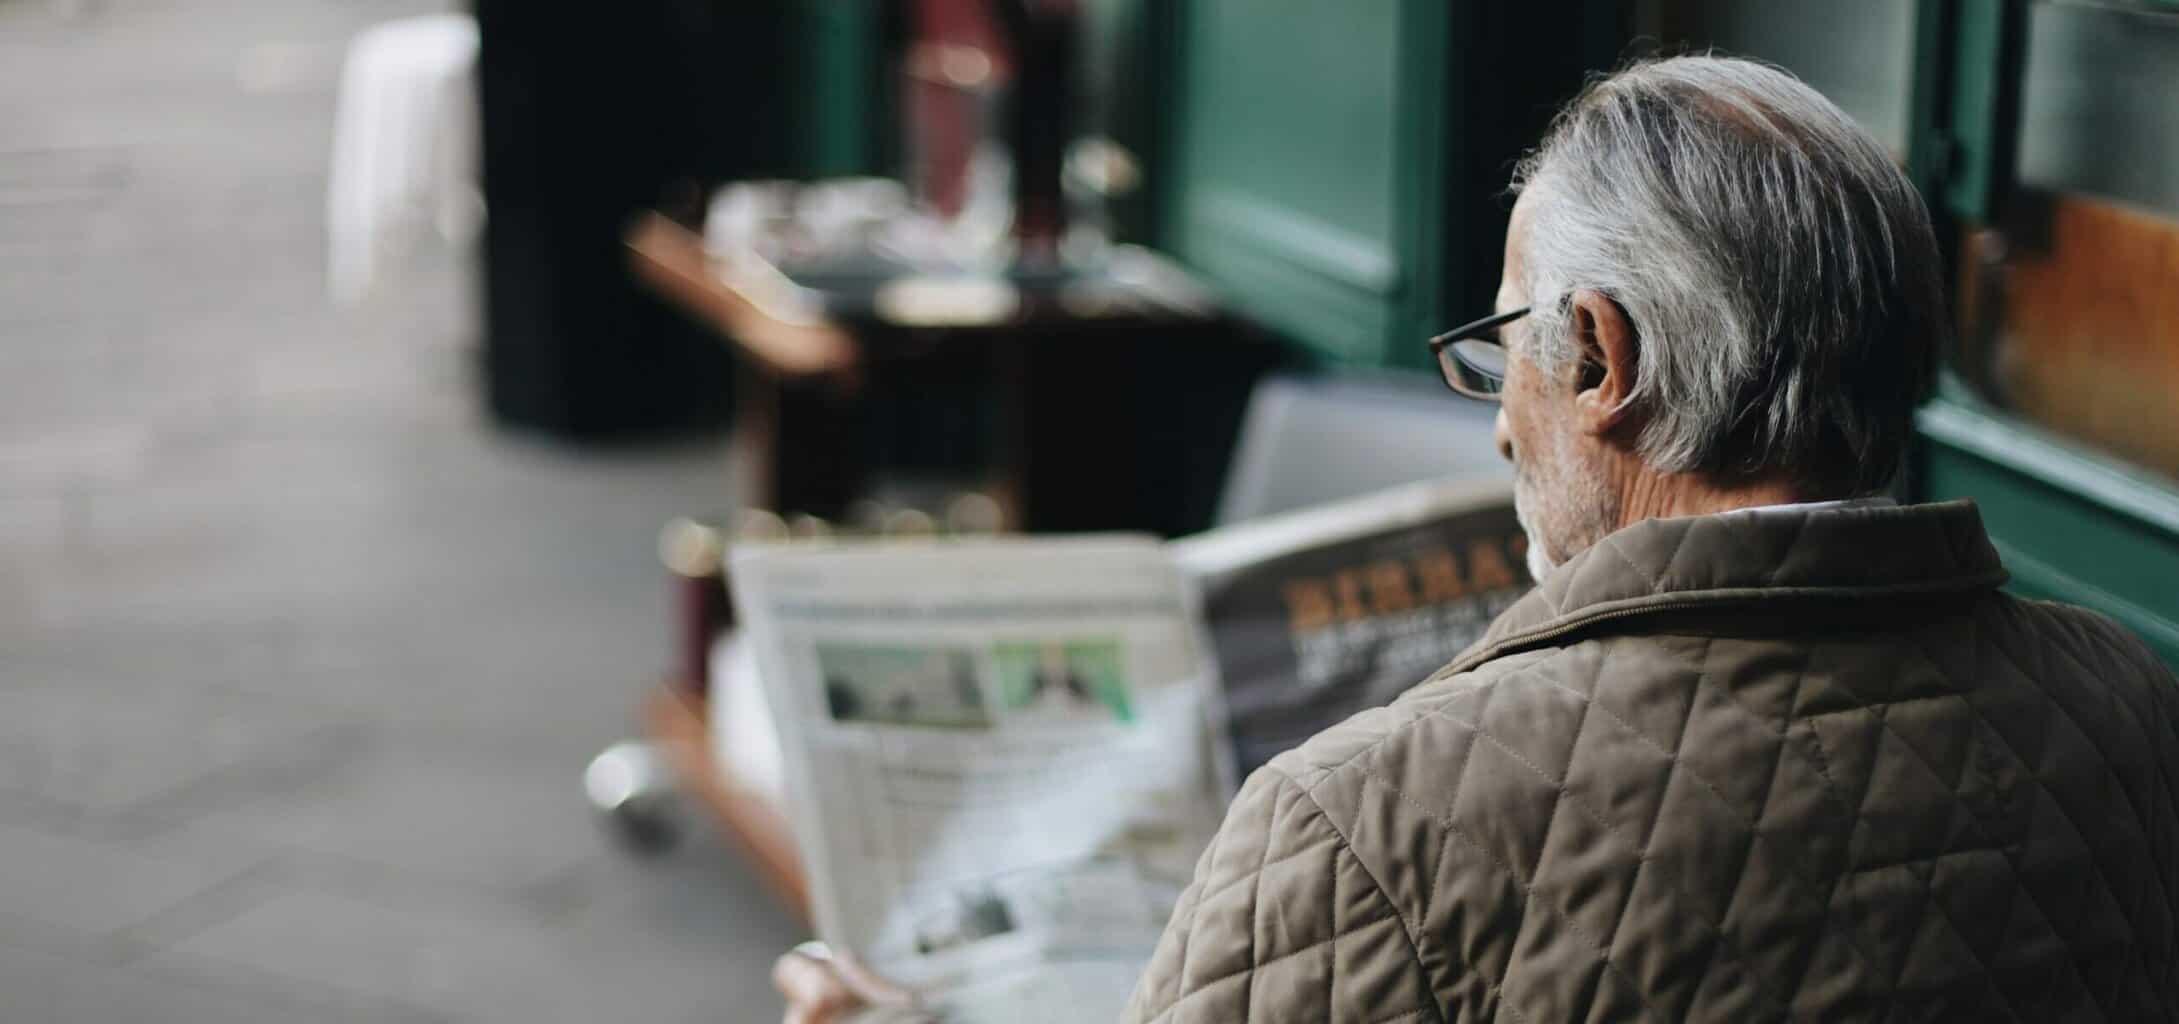 Man sitting while reading newspaper